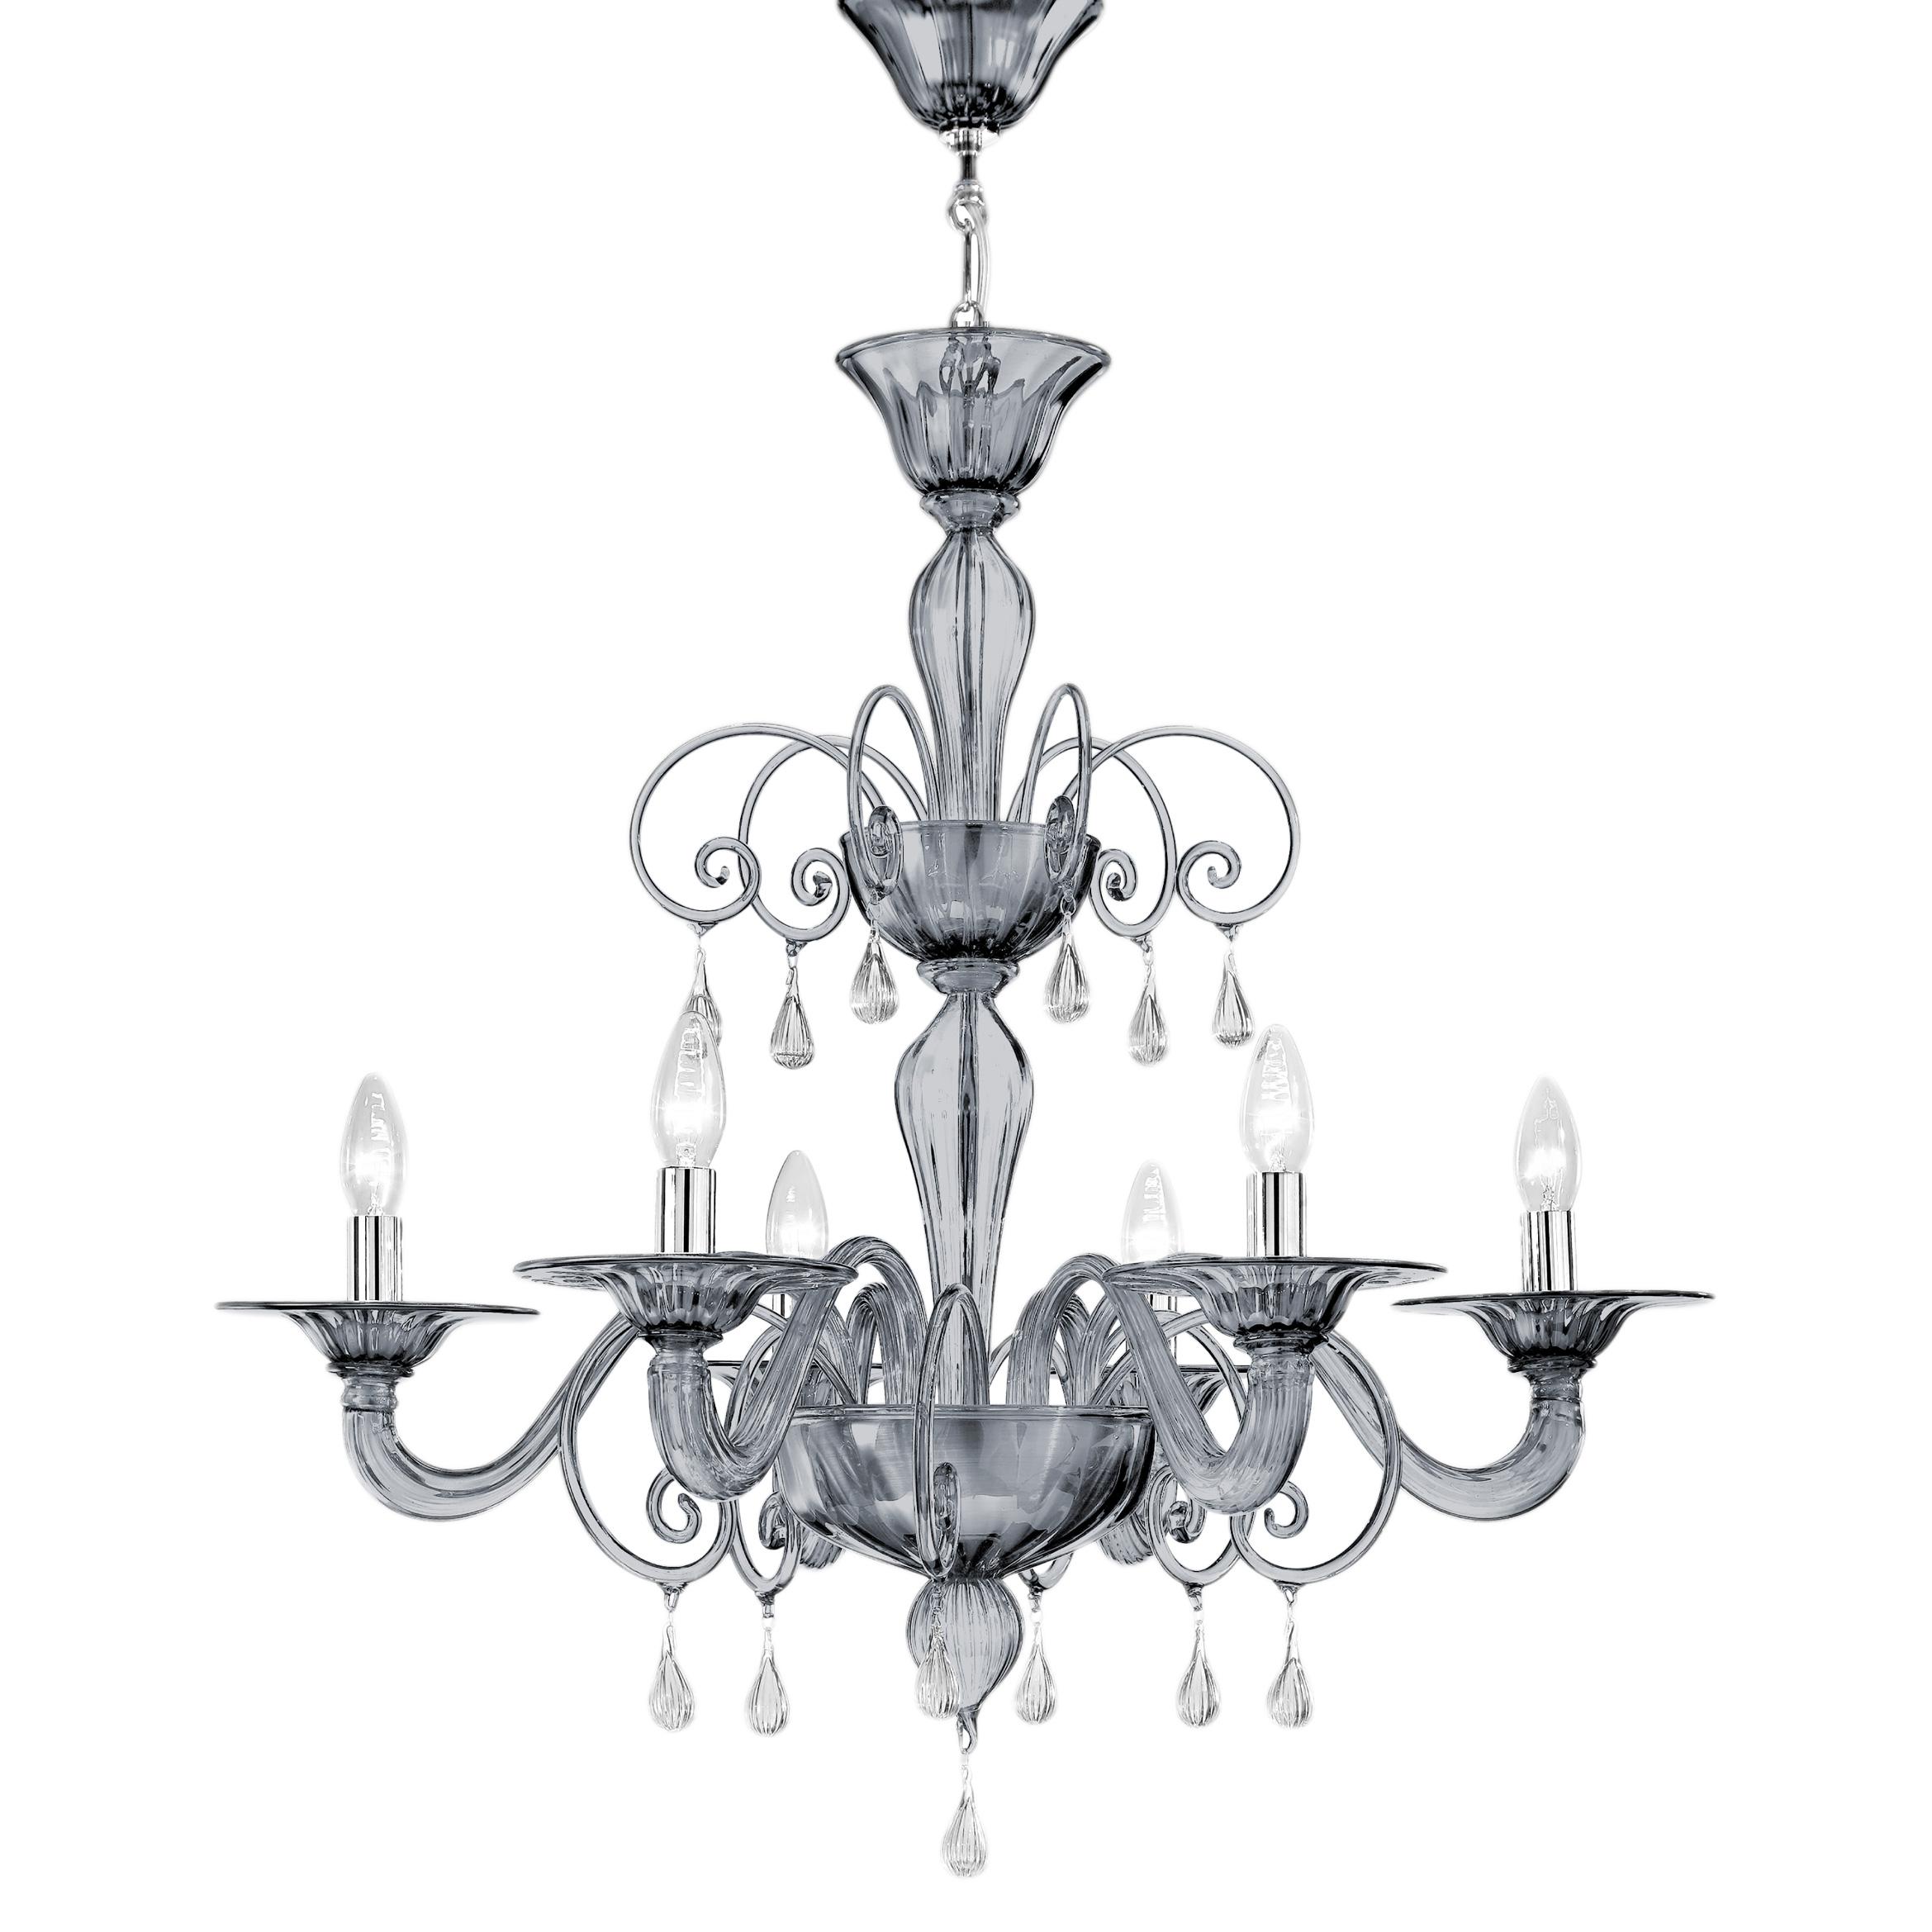 Jasmine villaverde london villaverde london jasmine slate murano chandelier square aloadofball Gallery